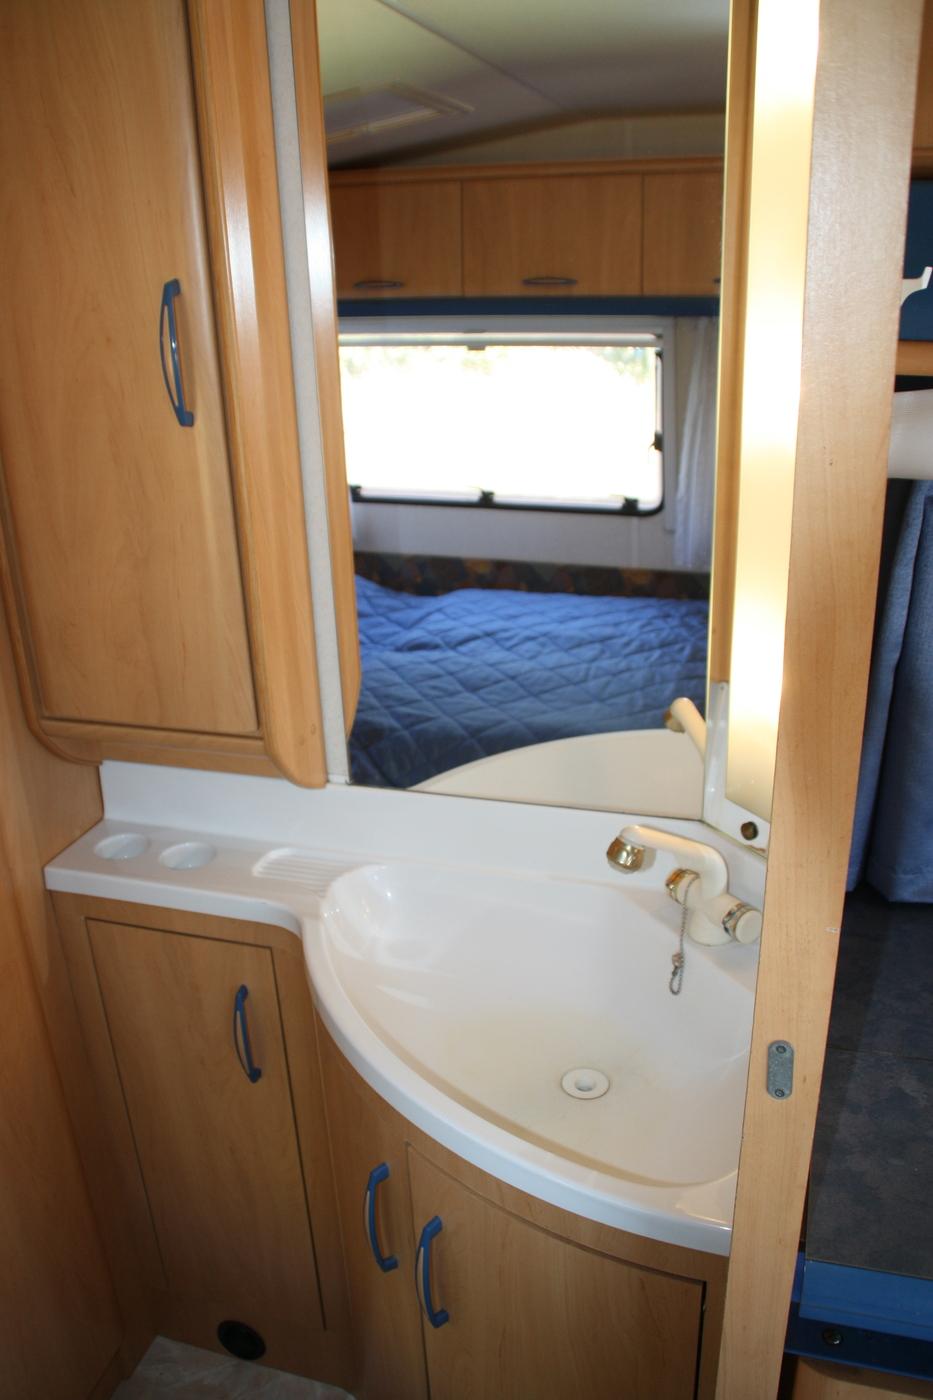 Thumb håndvask campingvogne udlejning aalborg